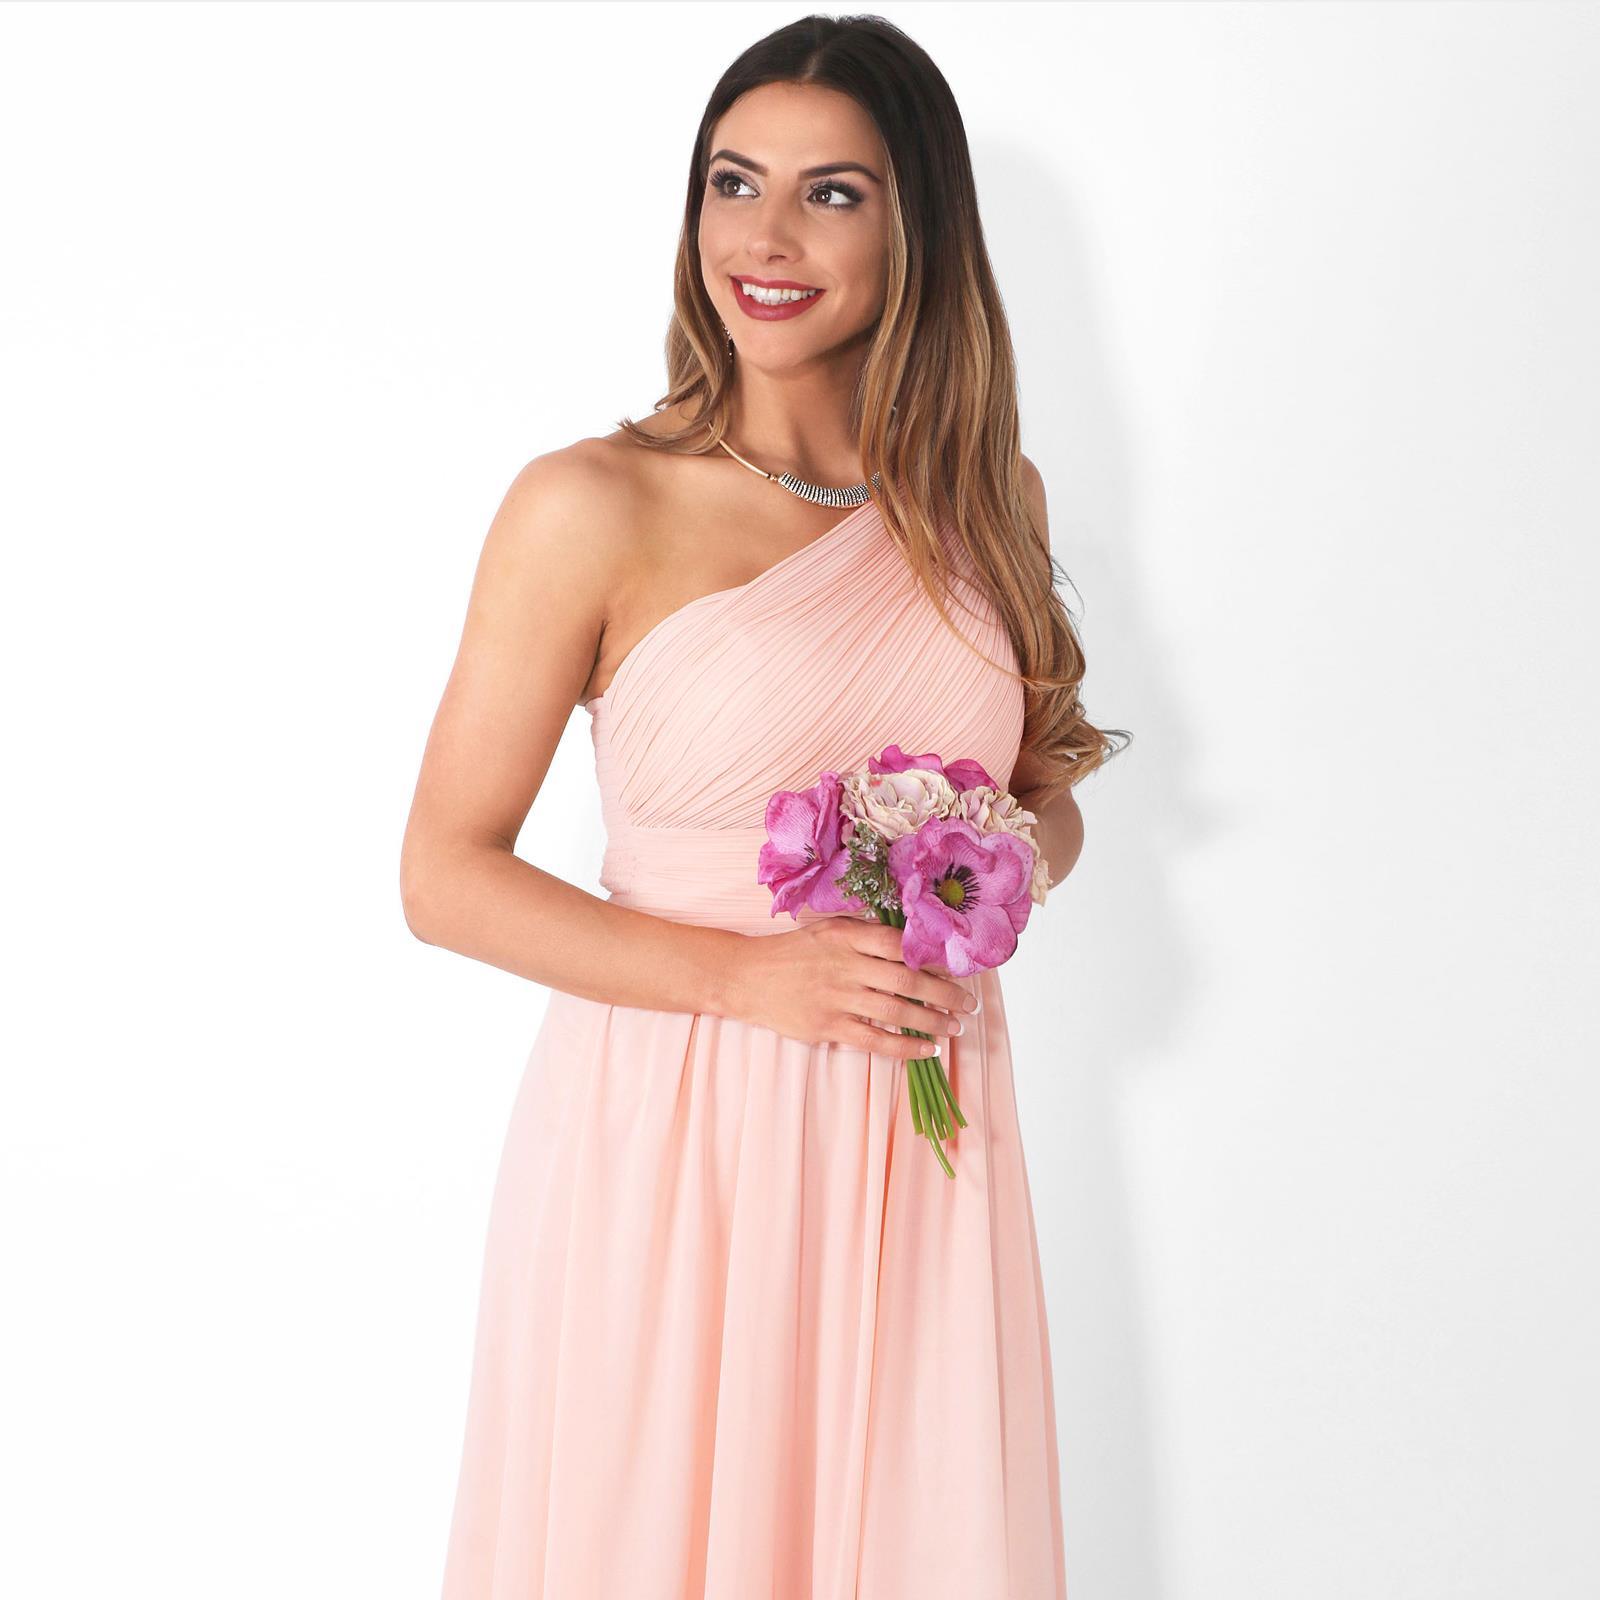 Womens-Wedding-Bridesmaid-Prom-Dress-Formal-One-Off-Shoulder-Long-Evening-8-18 thumbnail 49